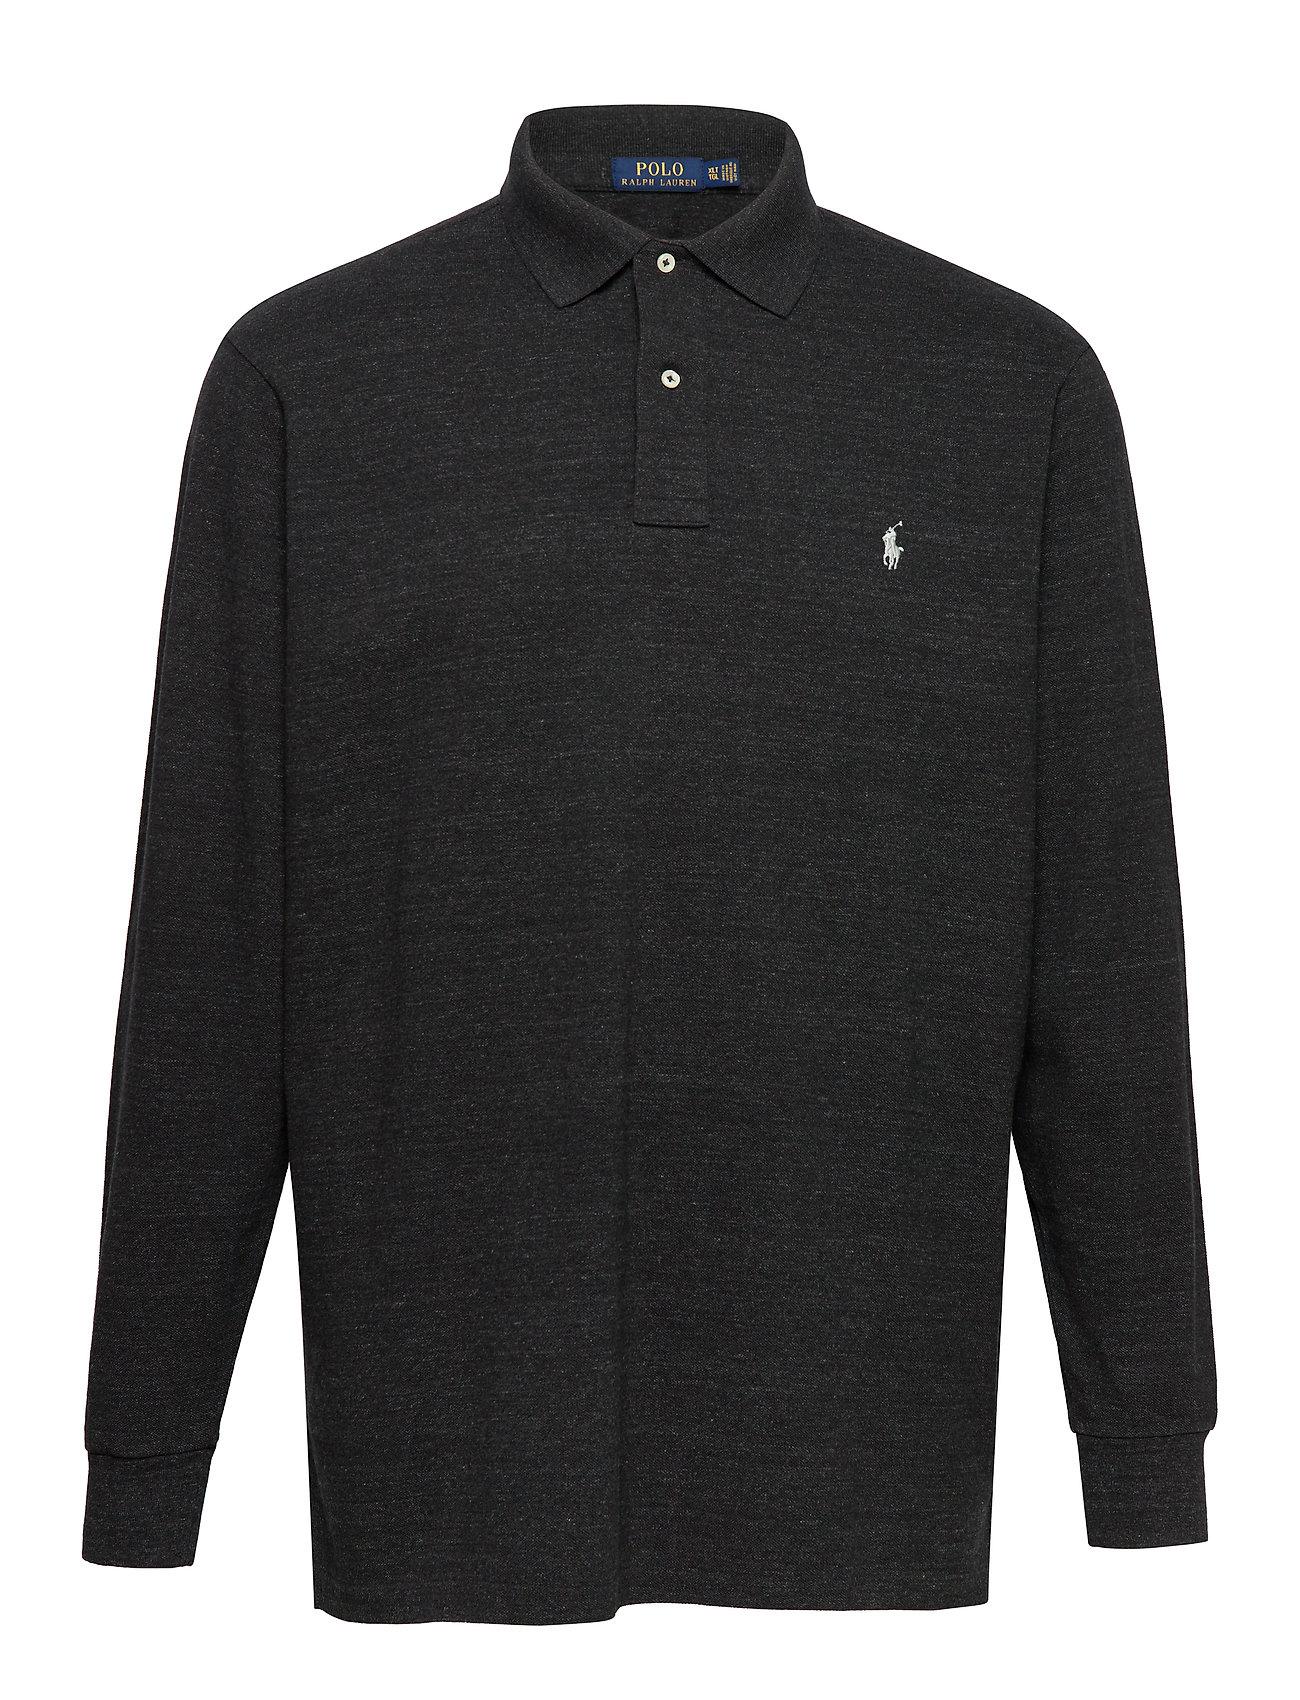 Polo Ralph Lauren Big & Tall Classic Fit Long-Sleeve Polo - BLACK MARL HEATHE